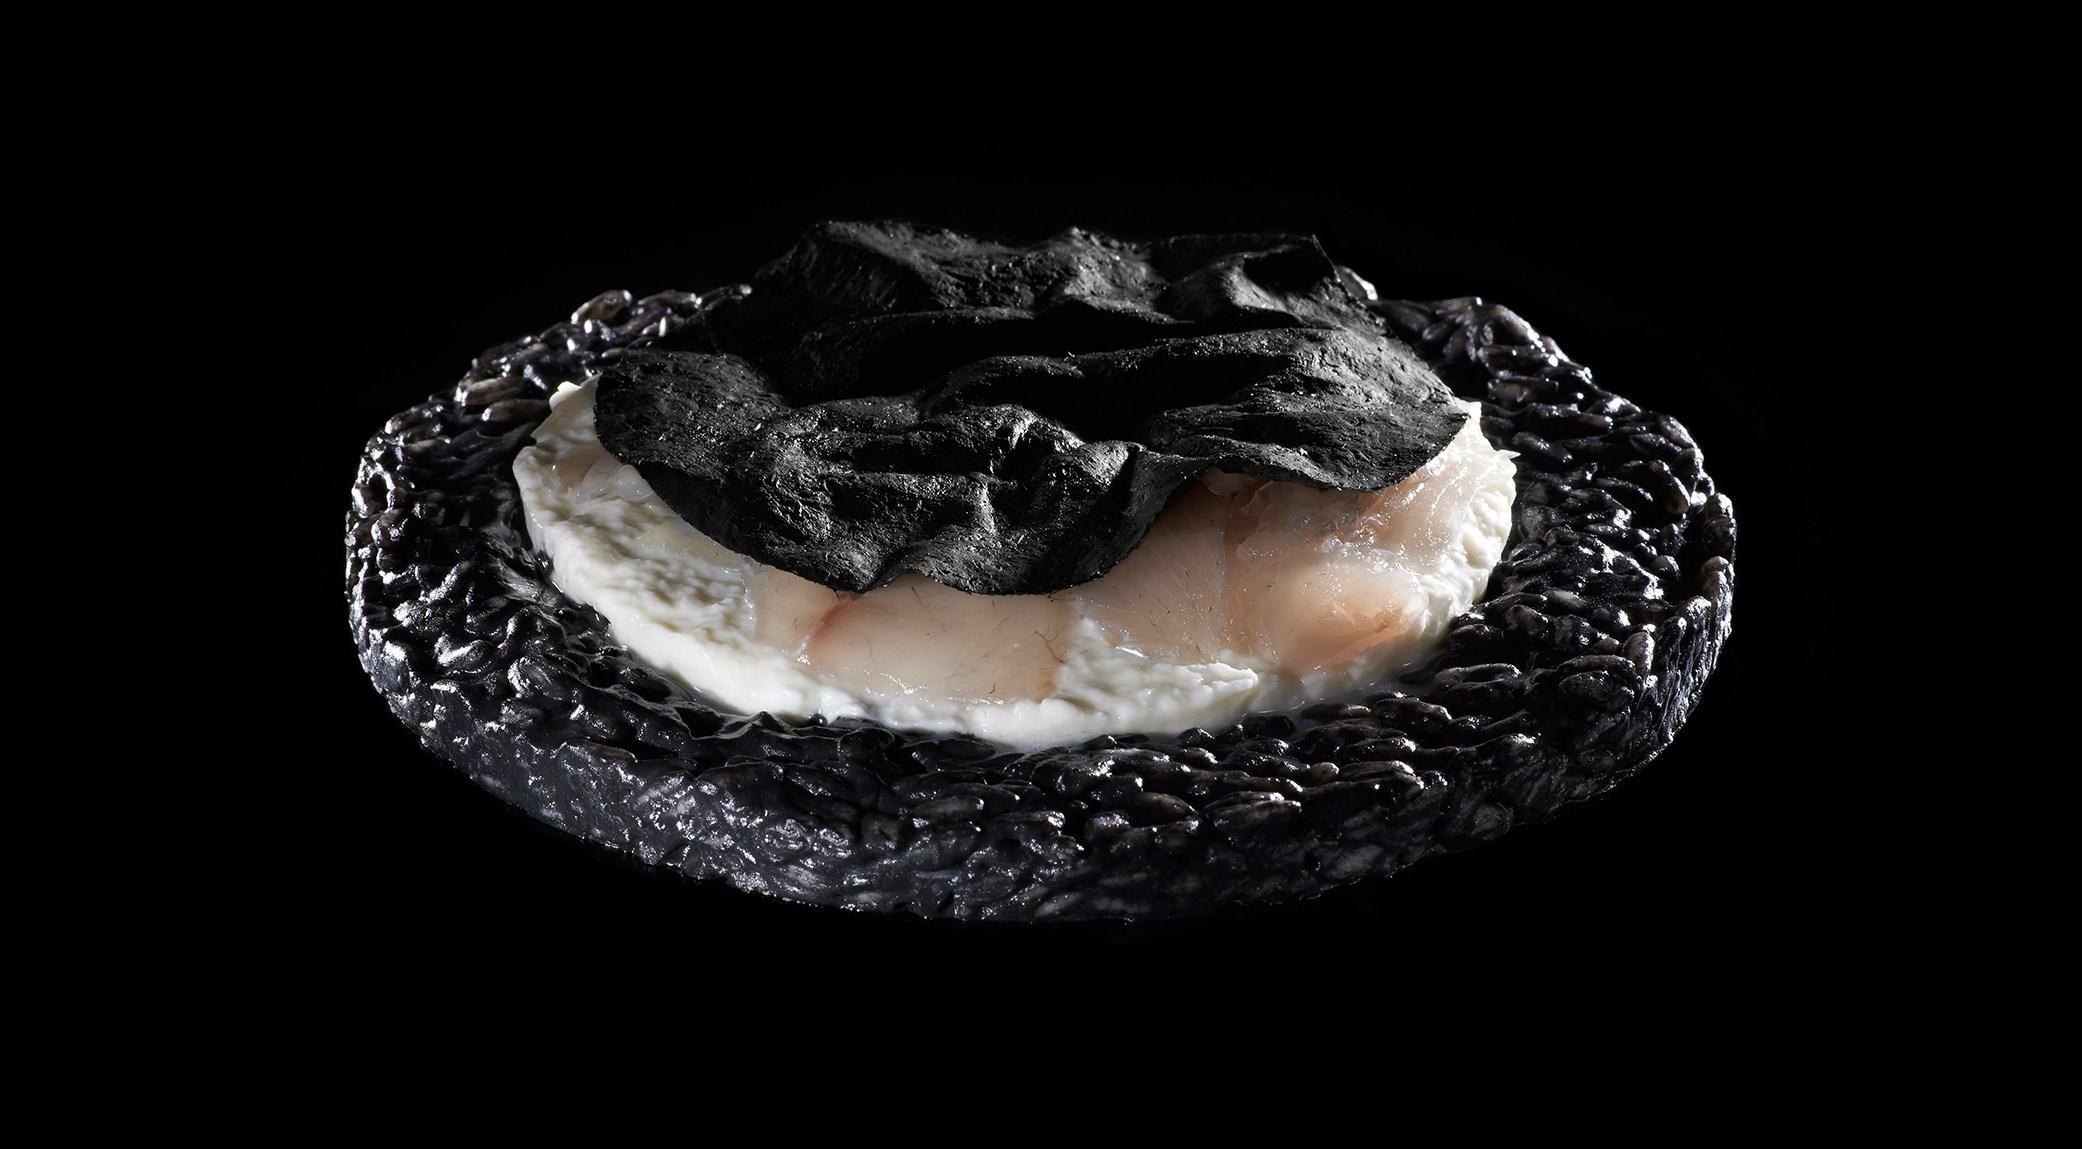 black-celebration-una-notta-dal-mare--Marco-Varoli-